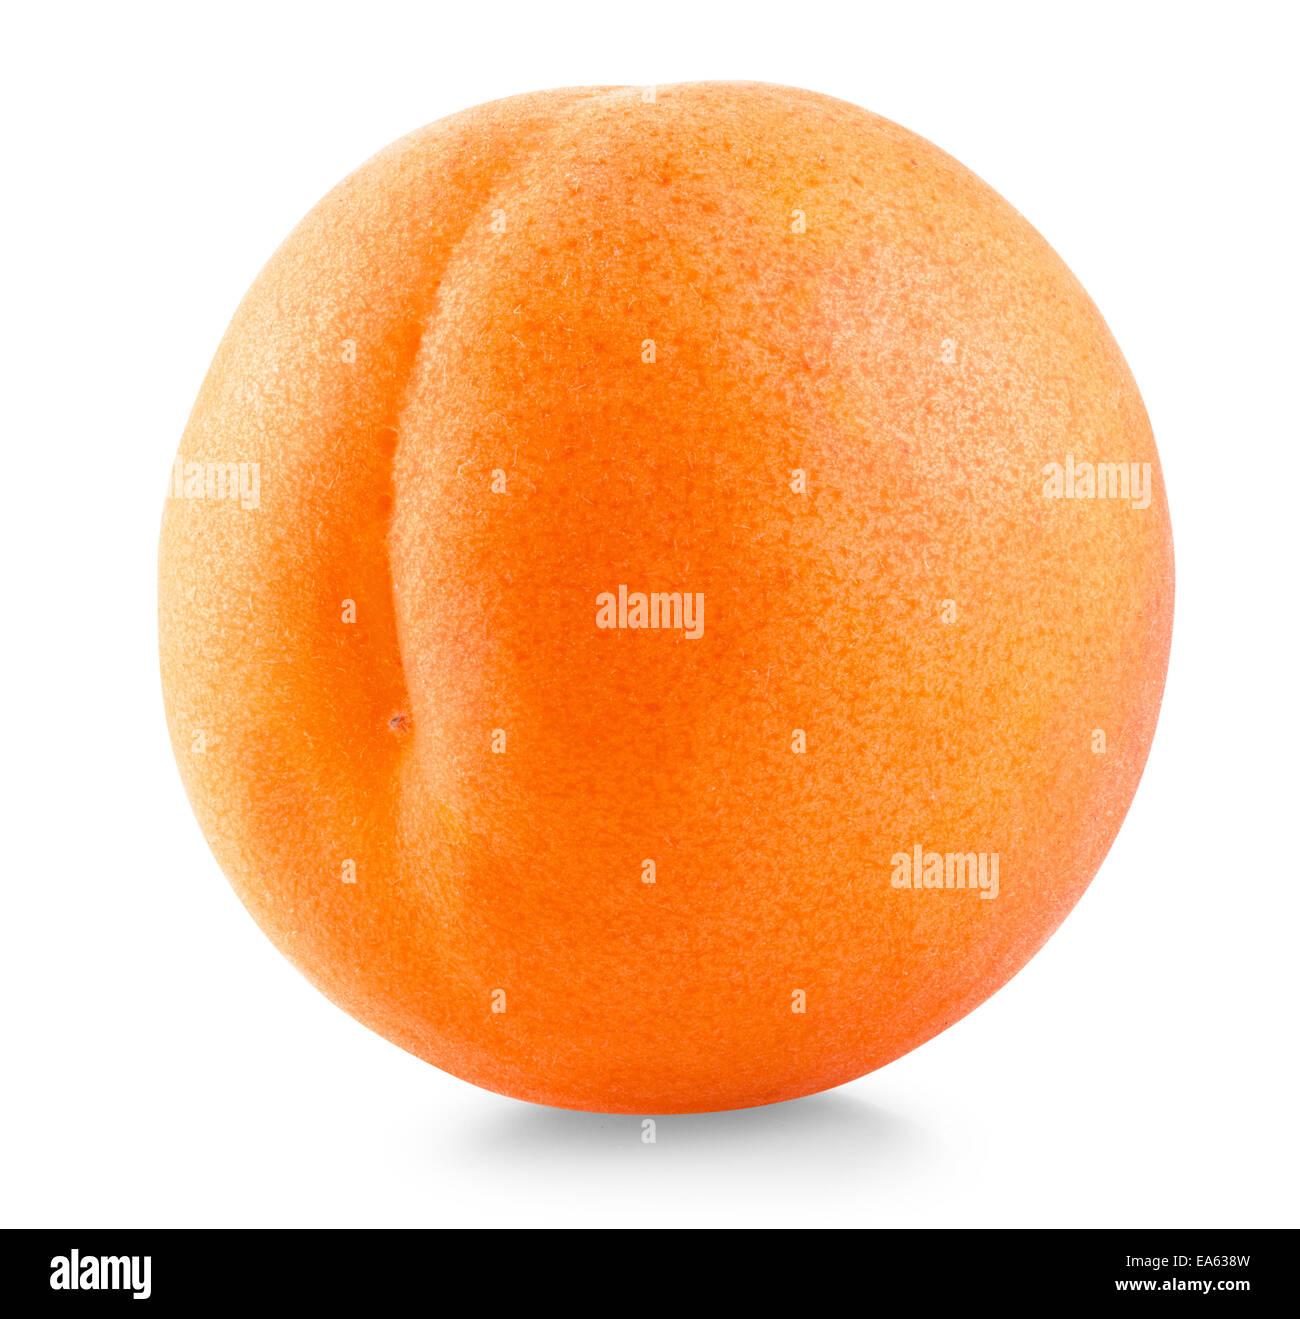 Apricot fruit - Stock Image